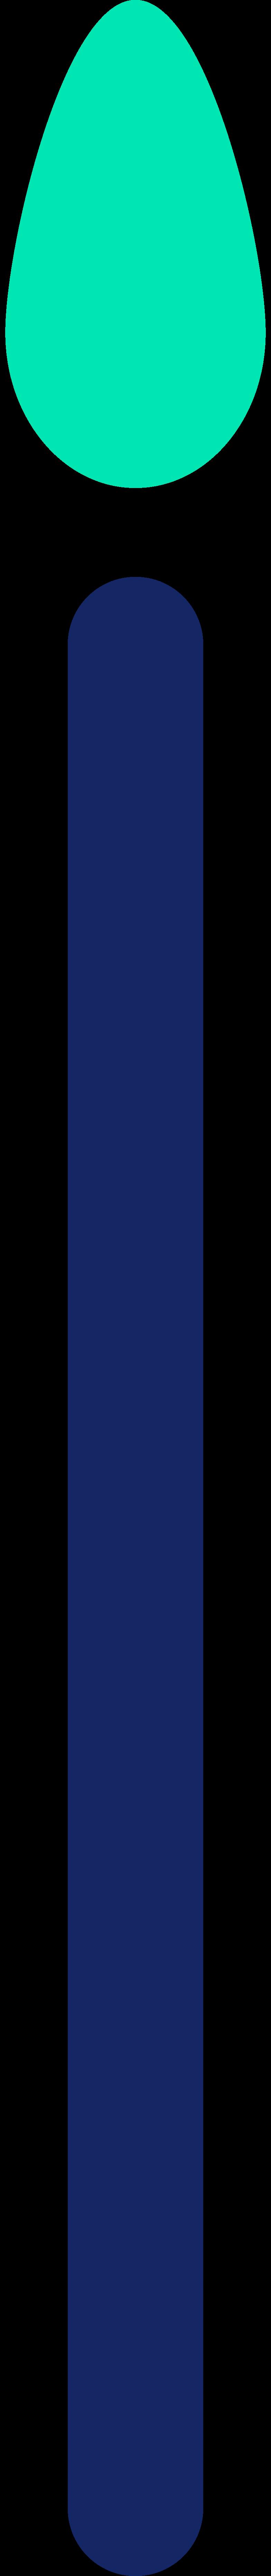 cocktail stick Clipart illustration in PNG, SVG